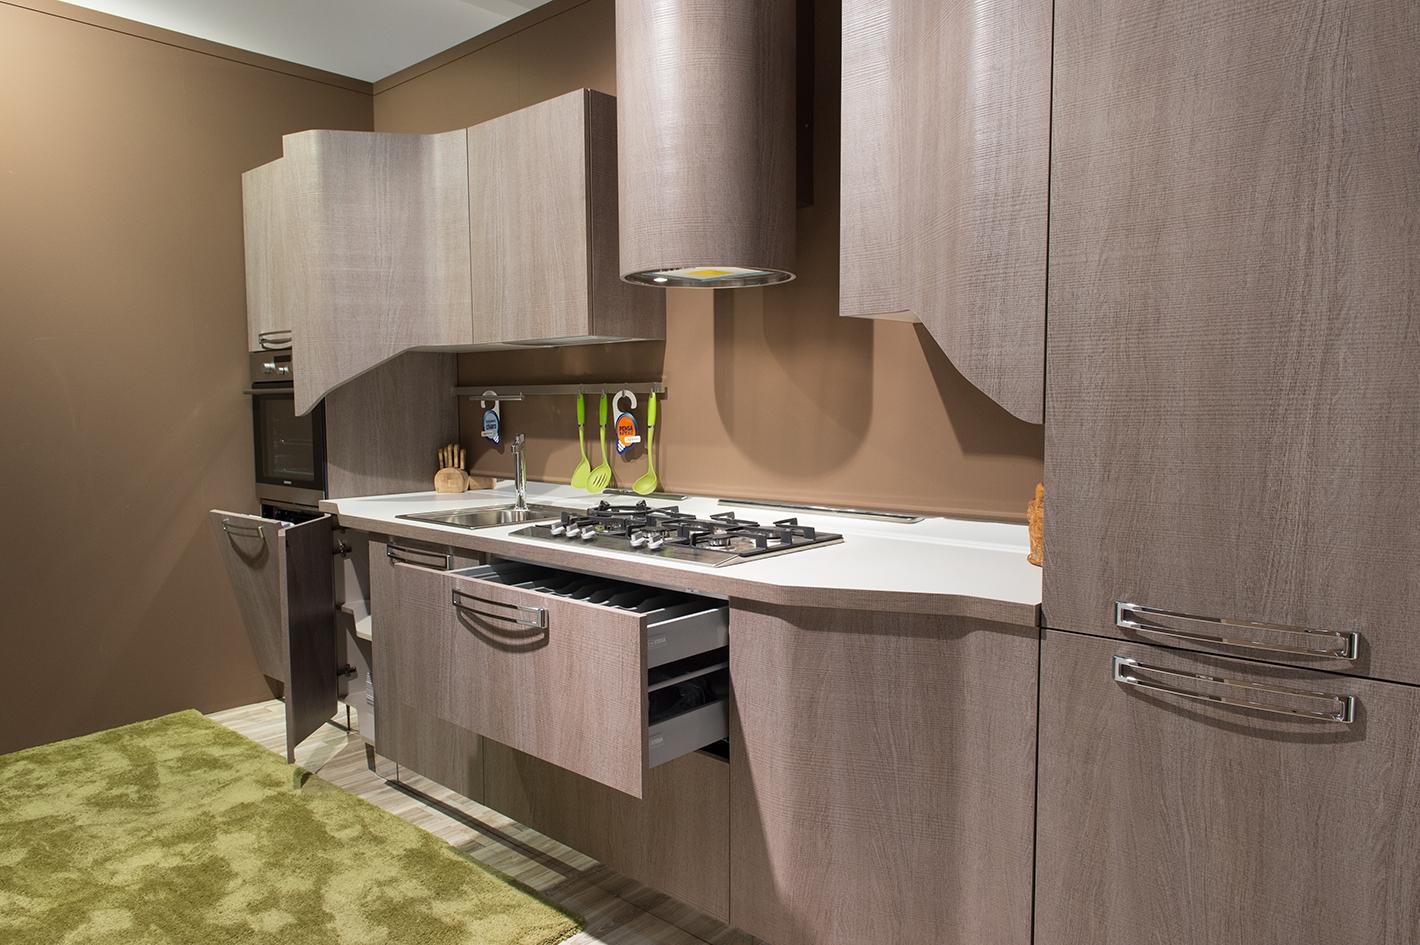 Cucina stosa mod milly completa di elettrodomestici 18689 - Disposizione elettrodomestici cucina ...